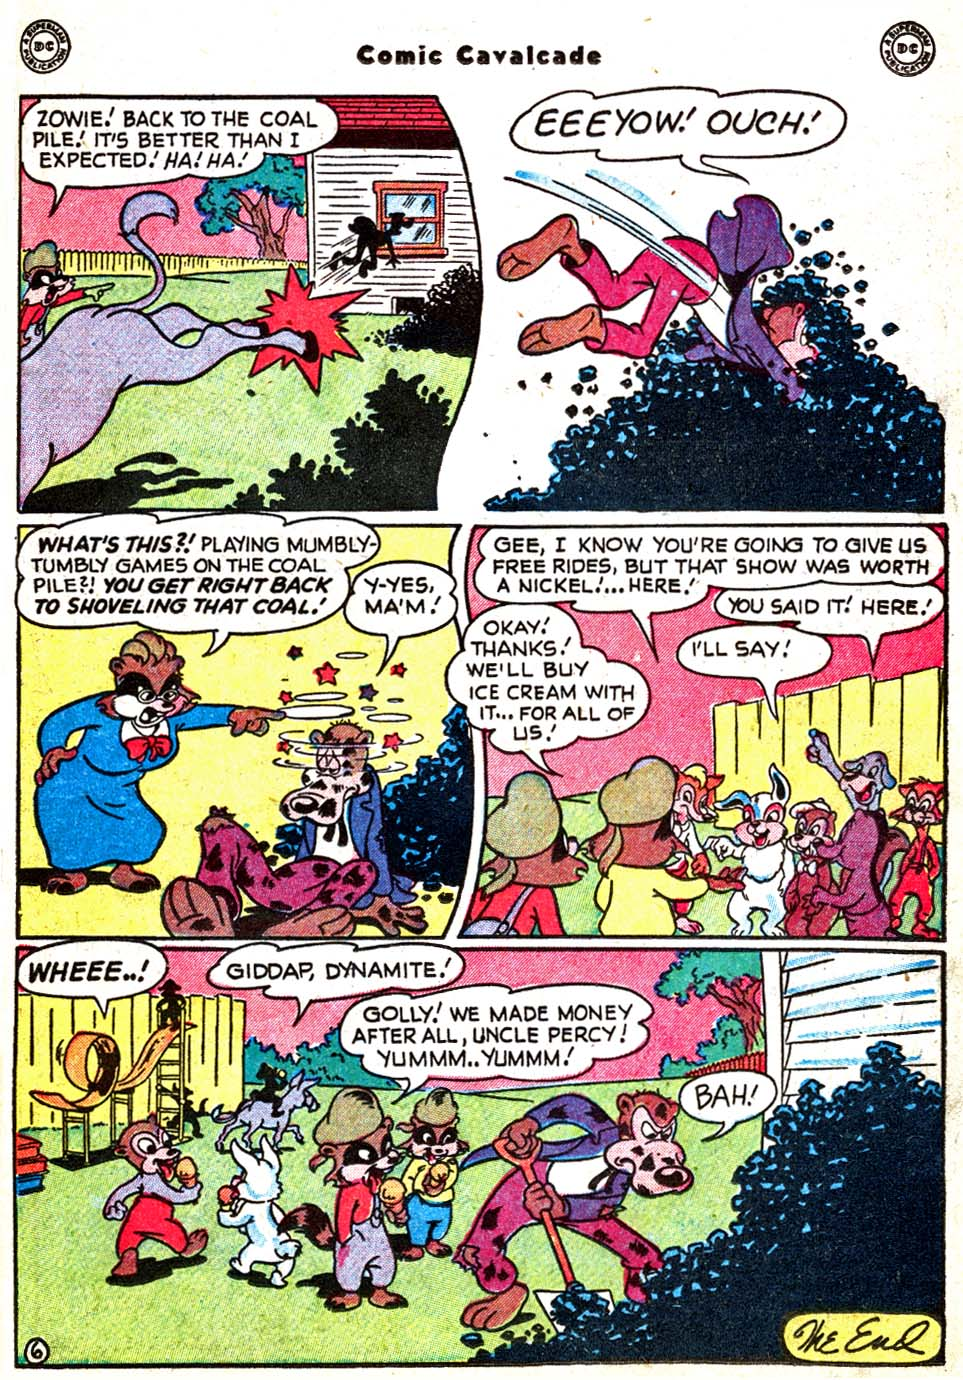 Comic Cavalcade issue 31 - Page 23